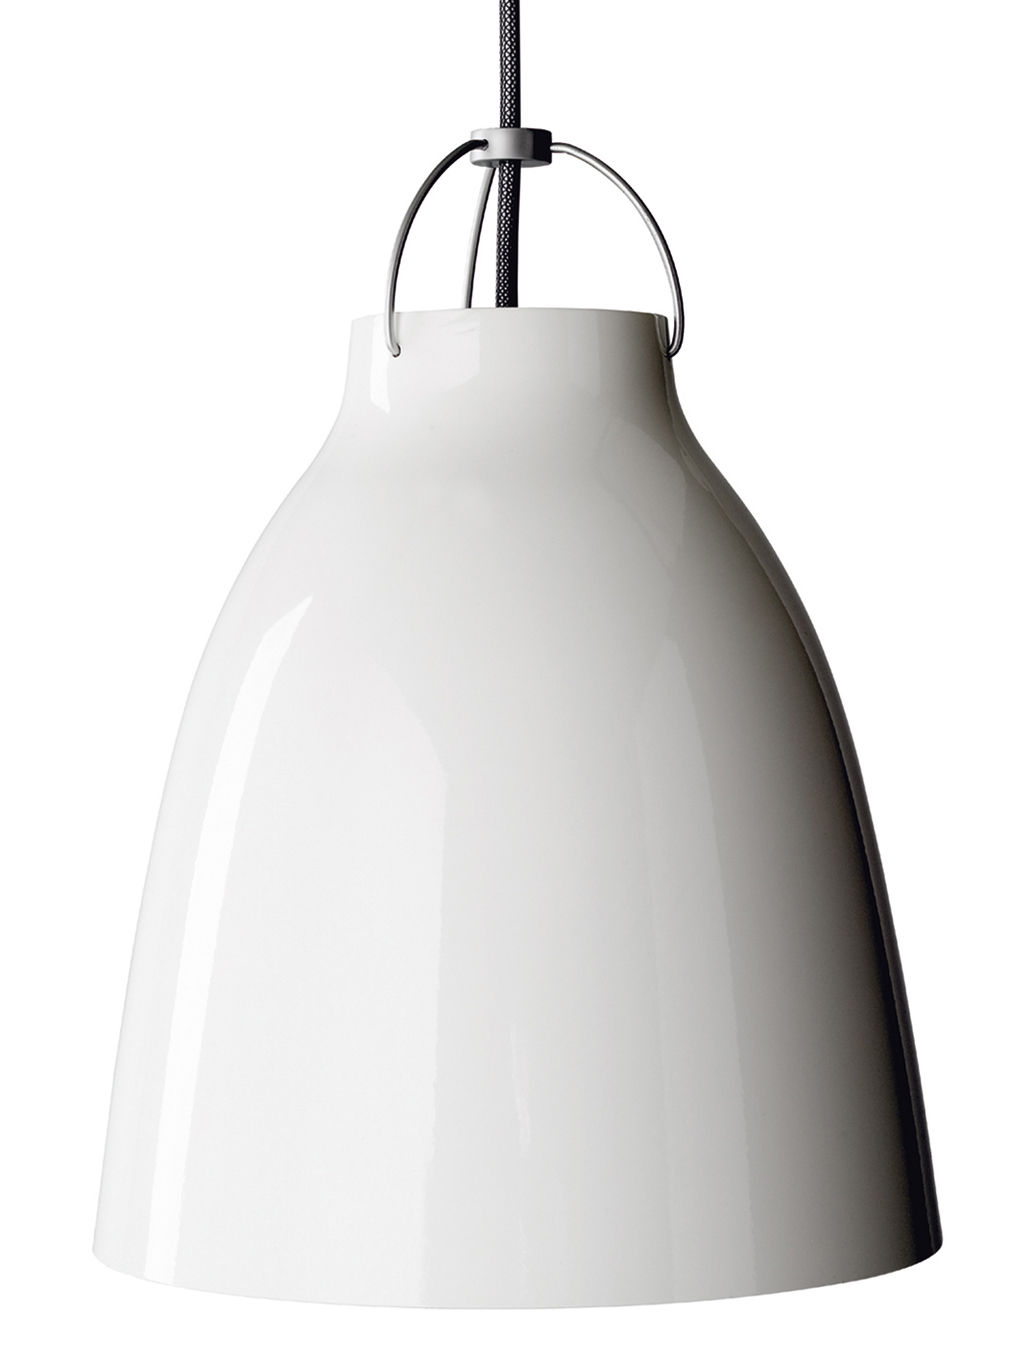 Lighting - Pendant Lighting - Caravaggio Large Pendant by Lightyears - White - Ø 40 cm - Lacquered aluminium